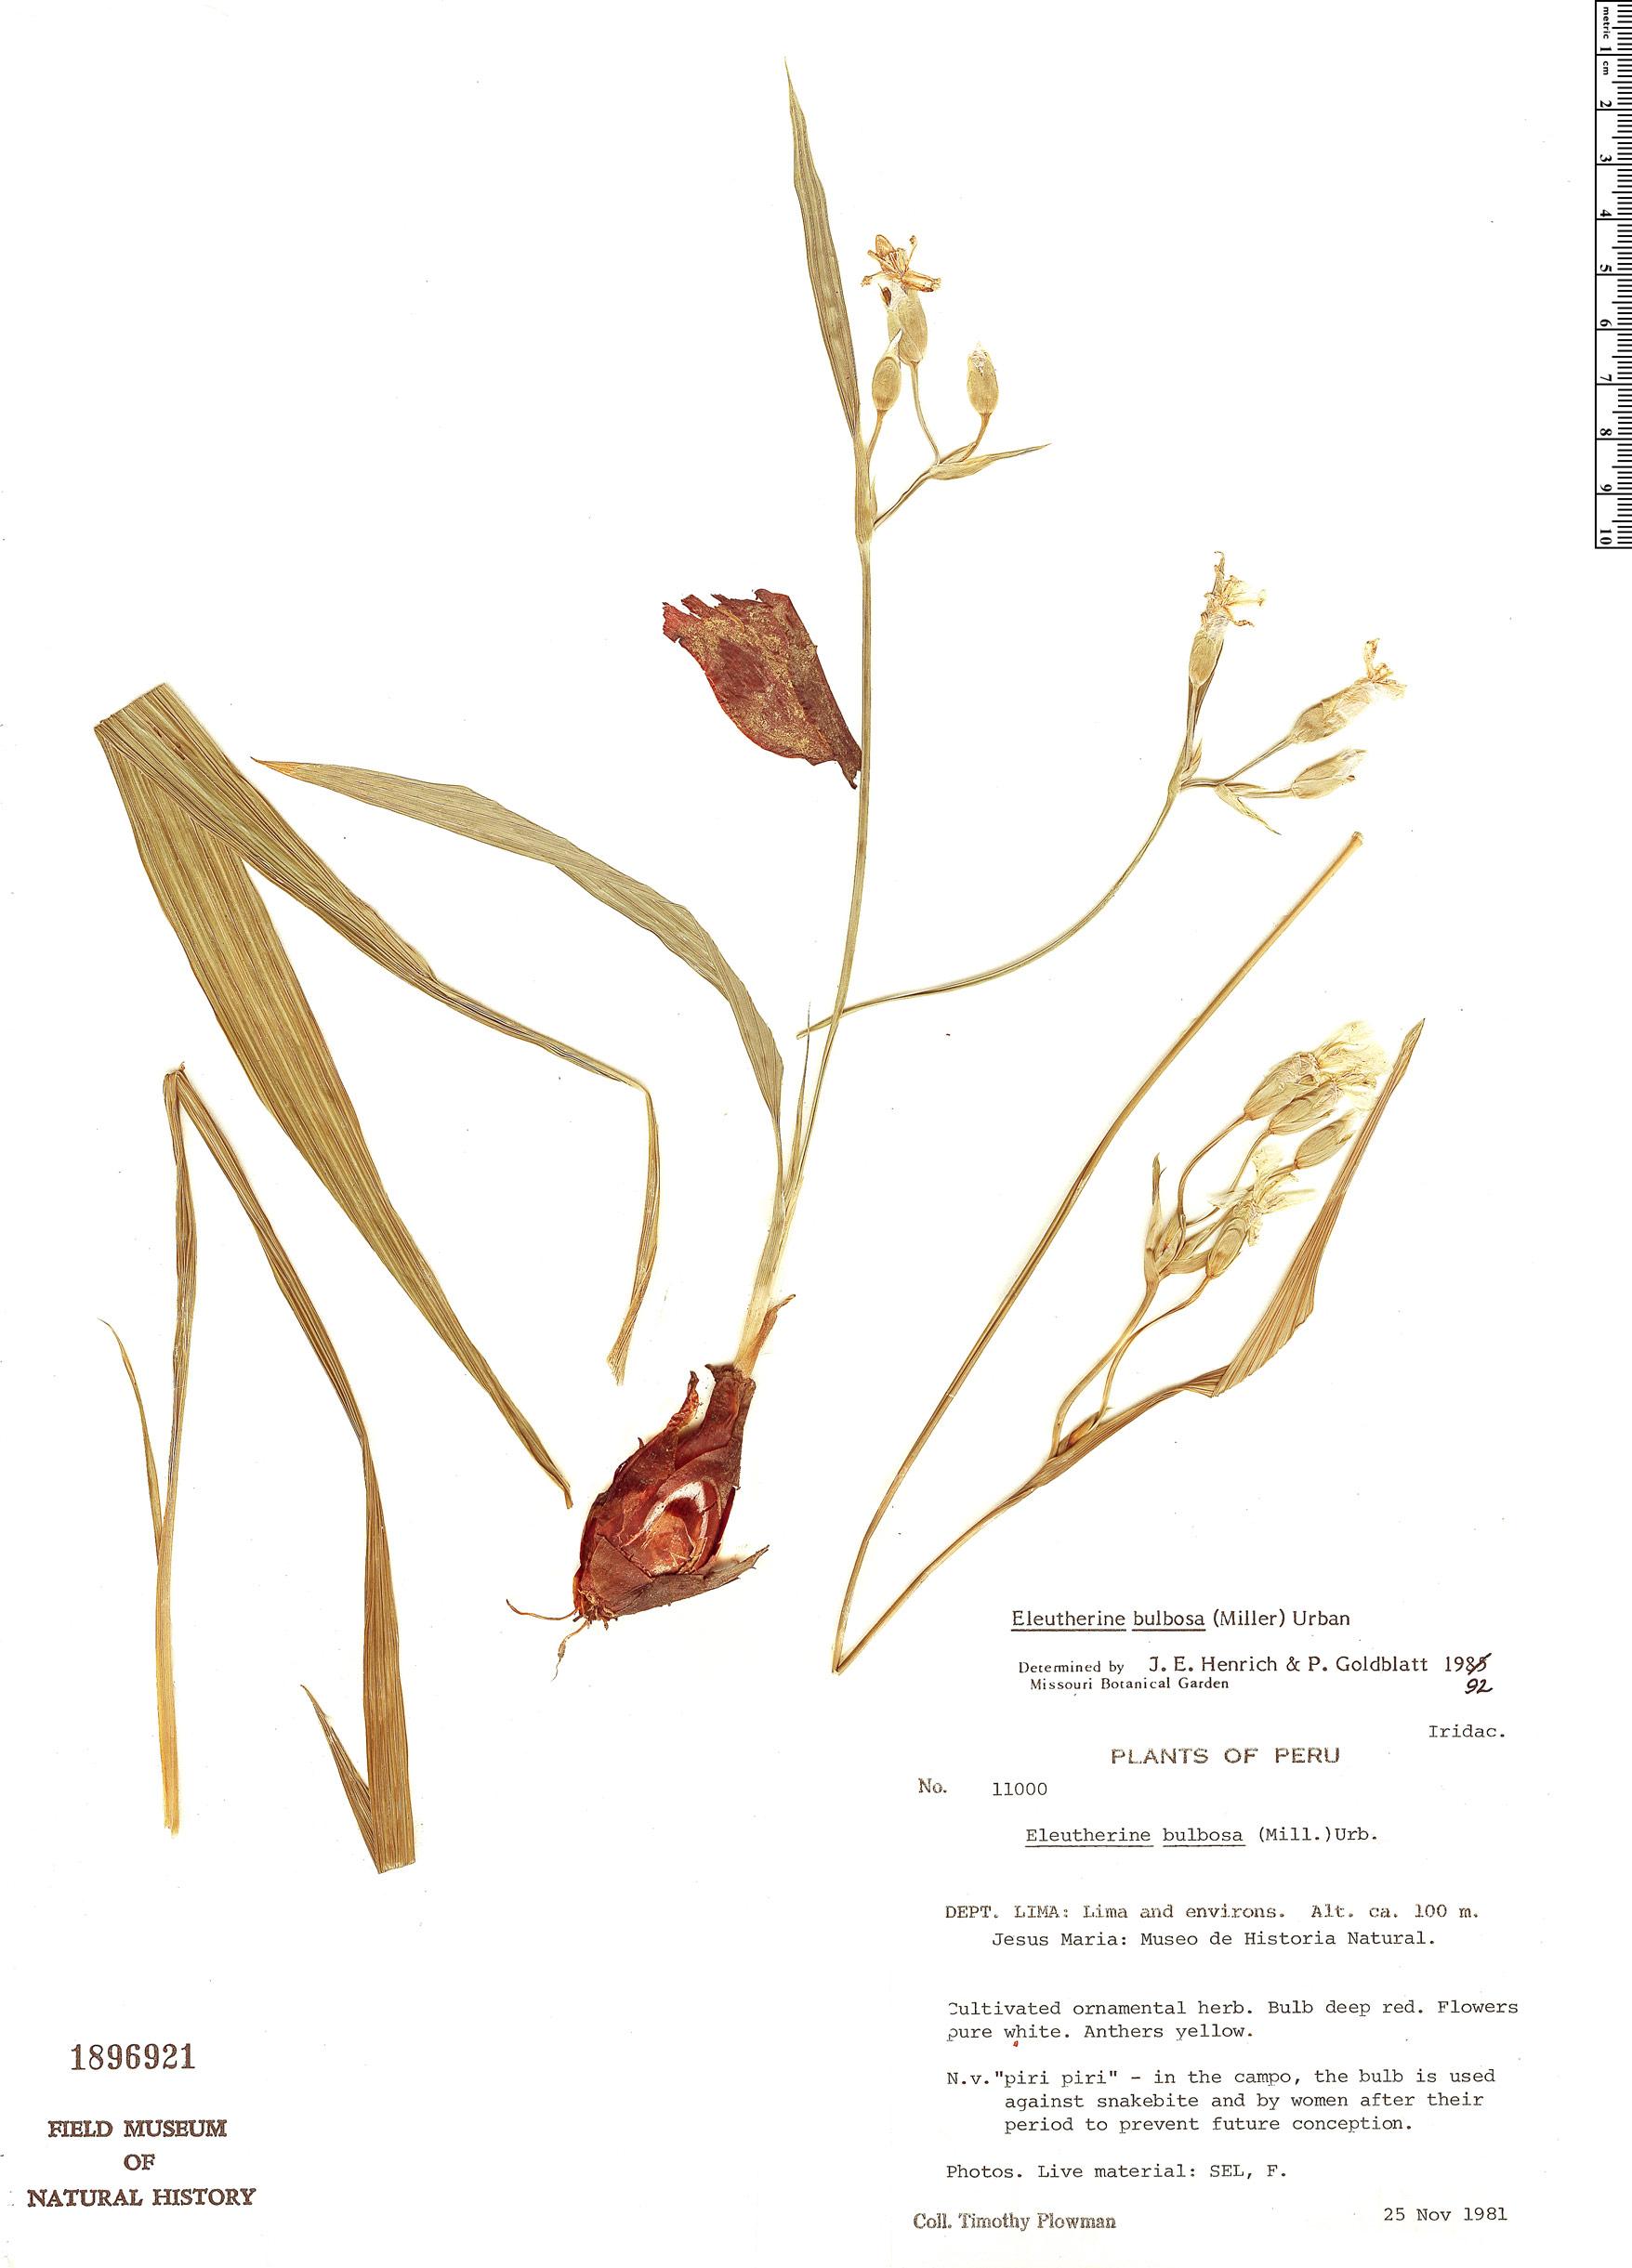 Espécime: Eleutherine bulbosa